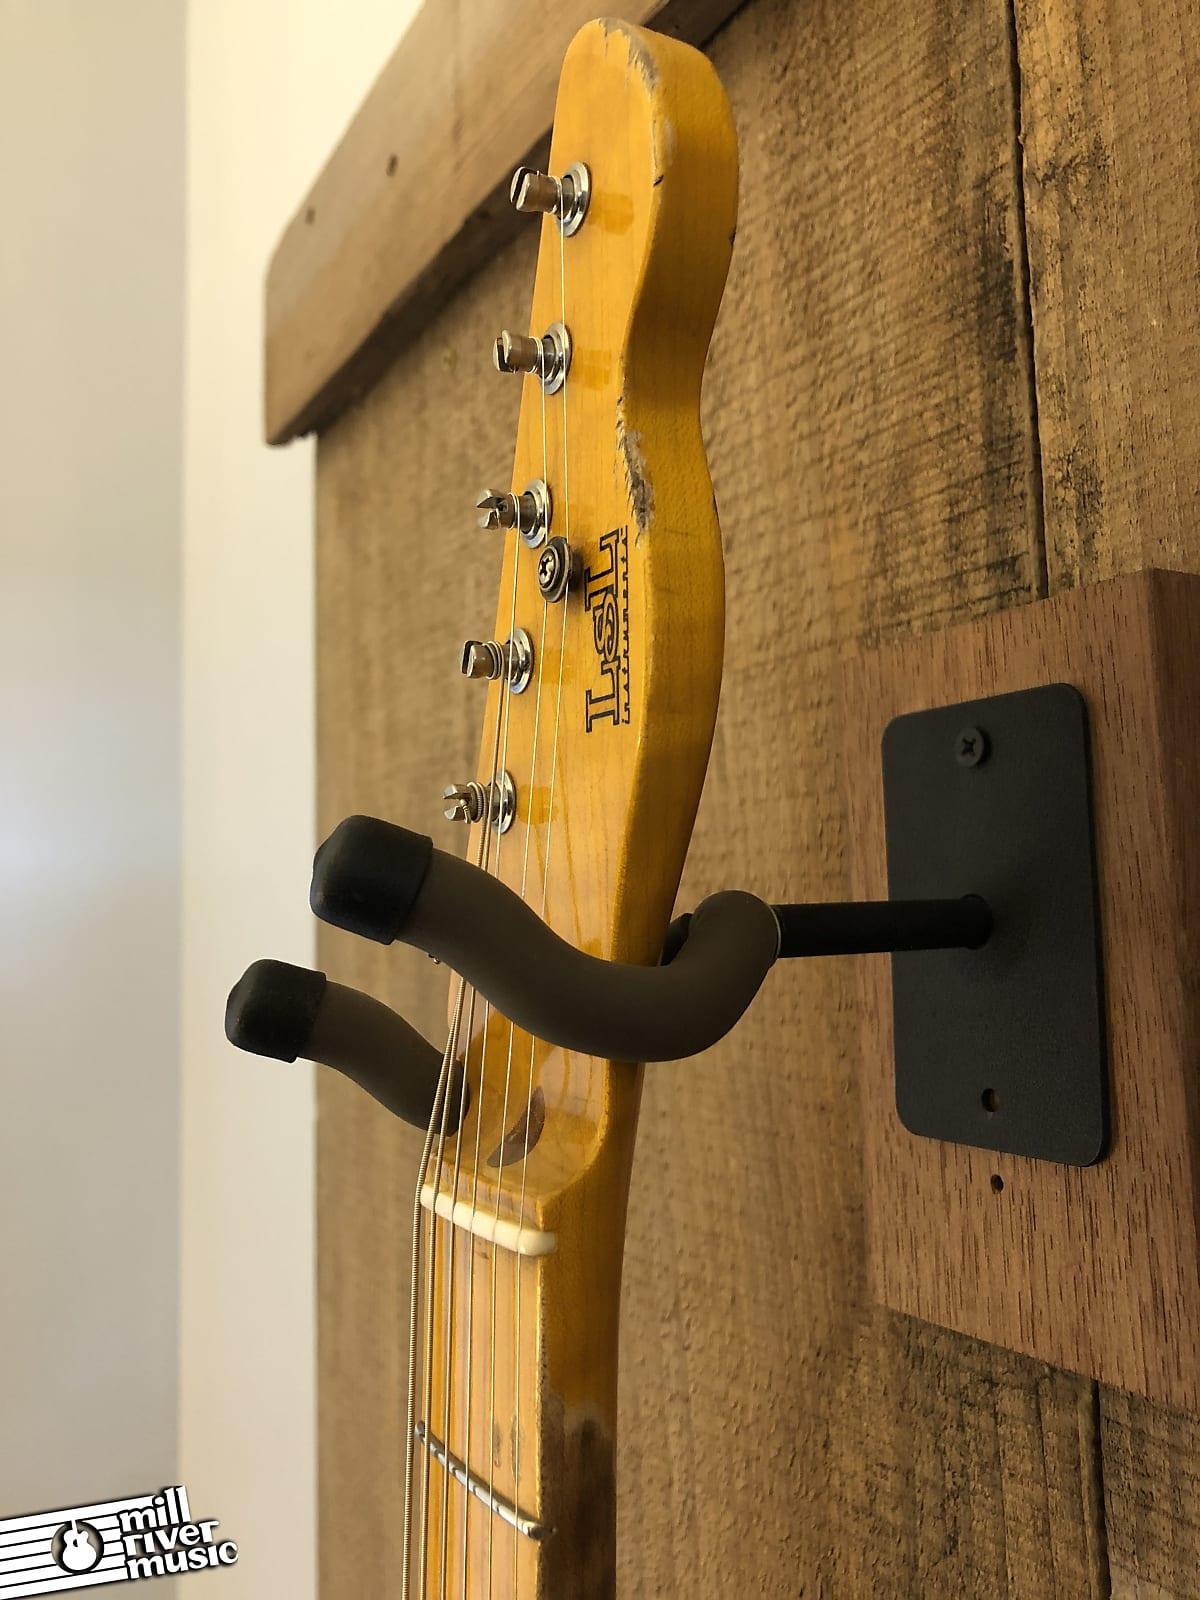 LsL Instruments Bad Bone 1 Tele-Style Butterscotch Relic 2018 w/ OHSC